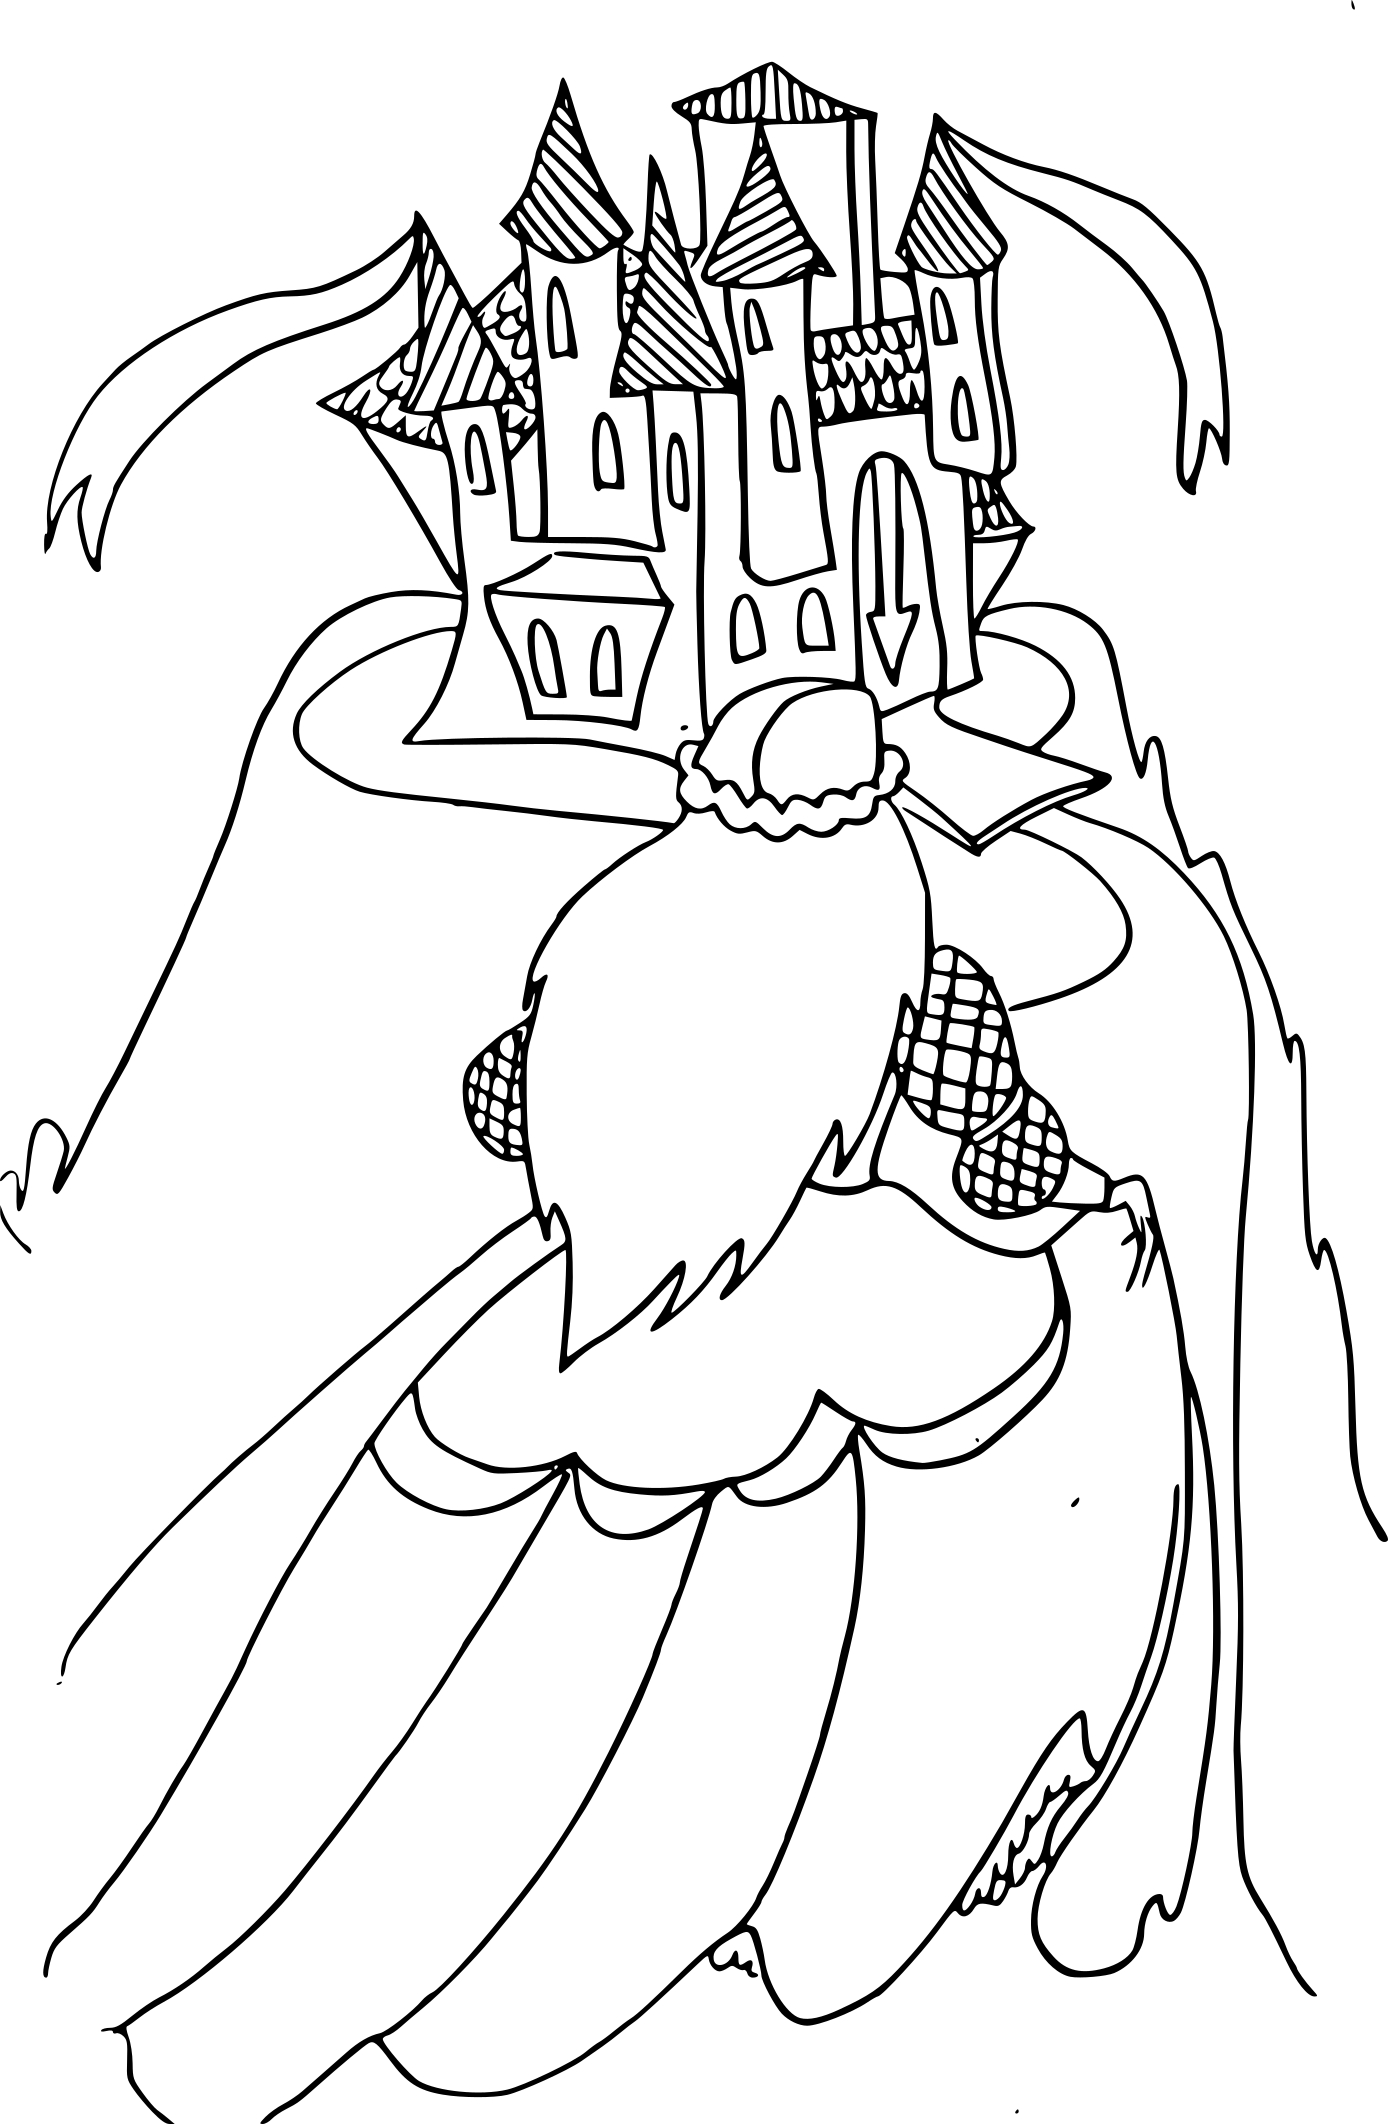 Coloriage château princesse à imprimer